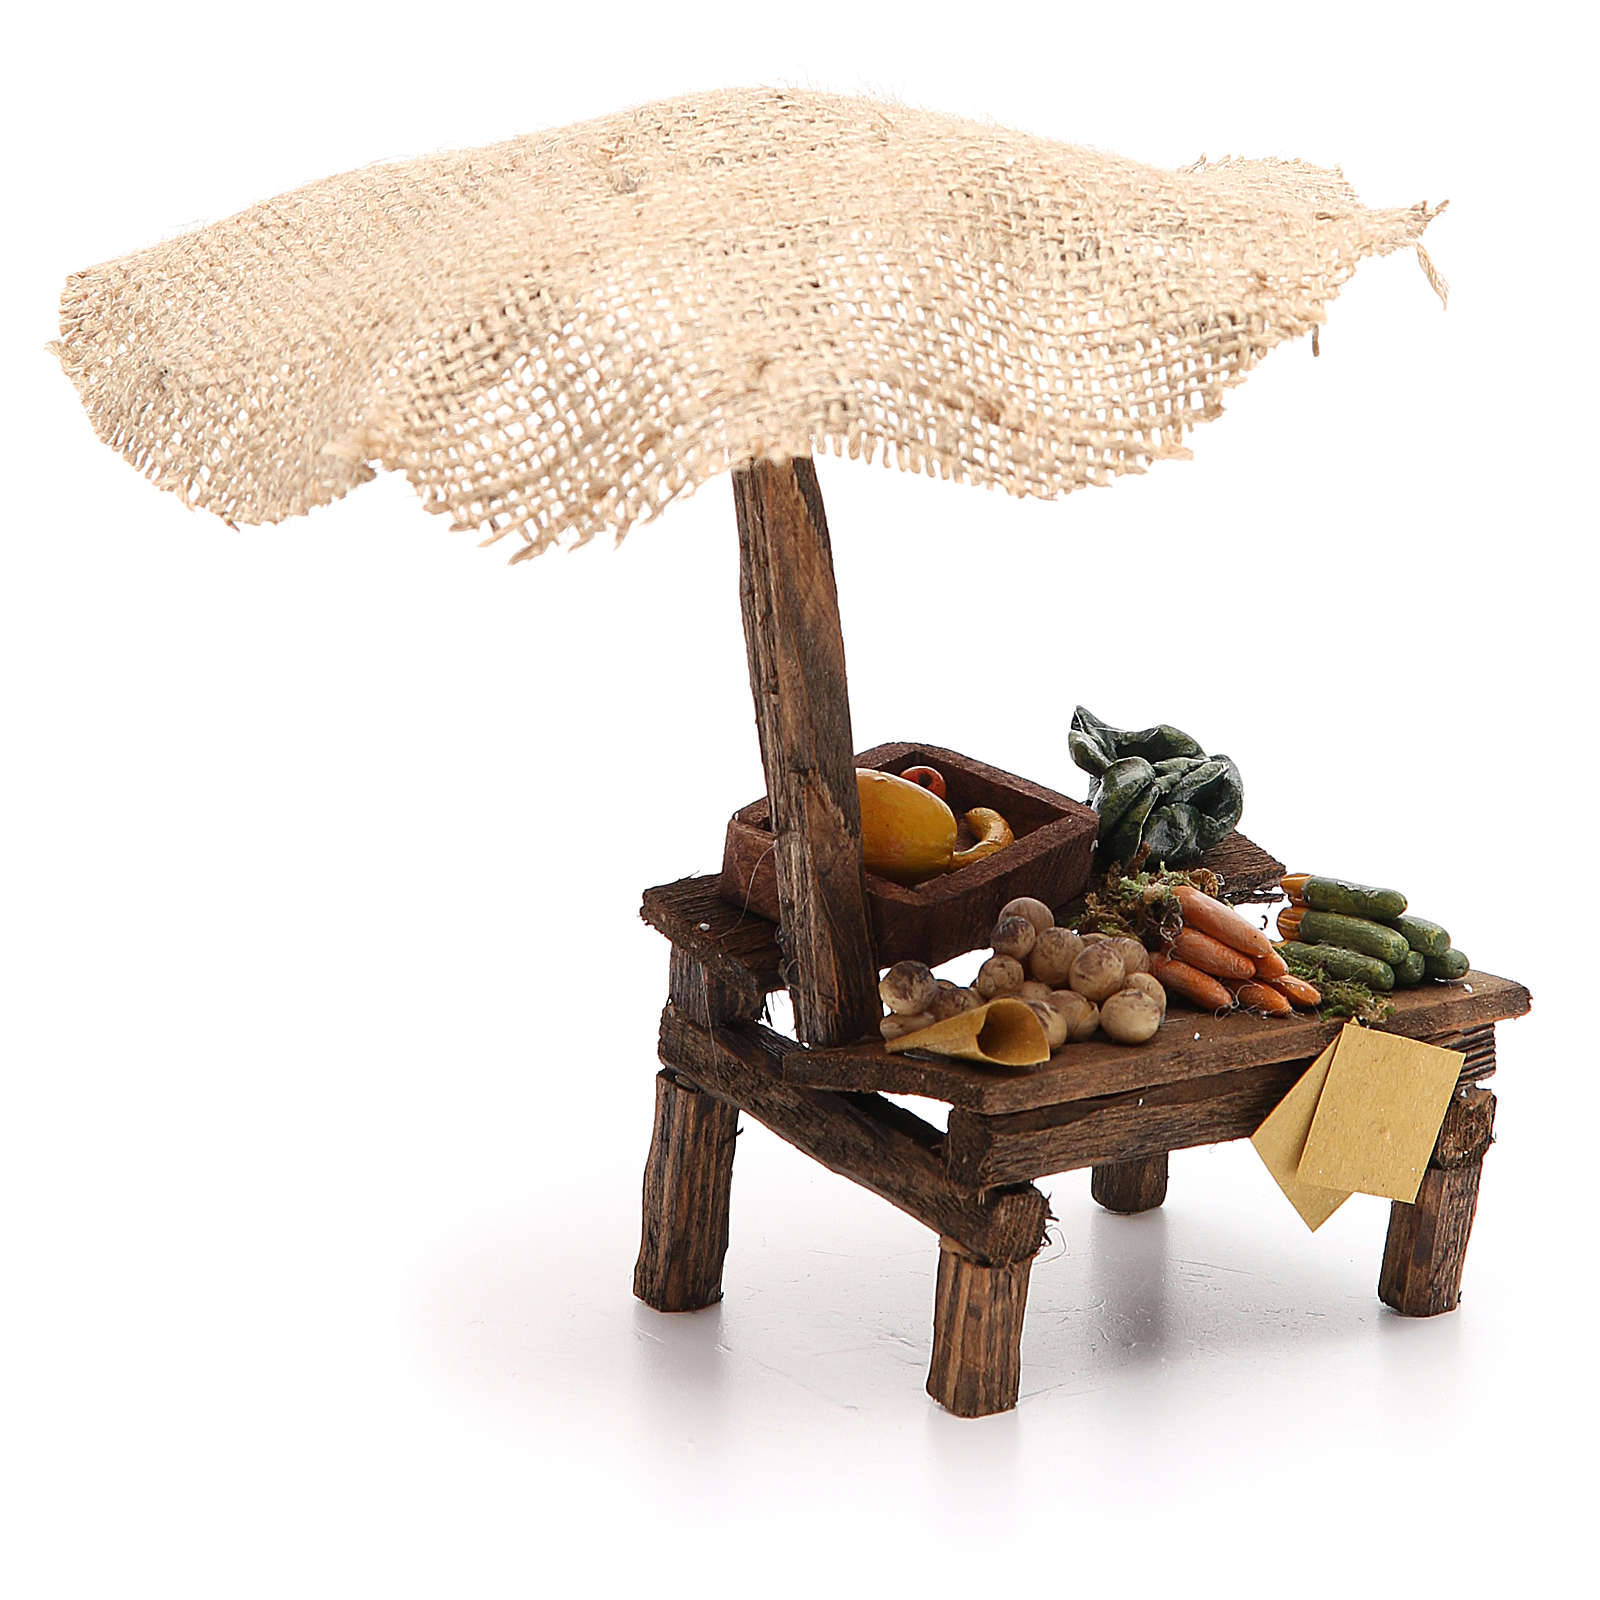 Workshop nativity with beach umbrella, vegetables 16x10x12cm 4